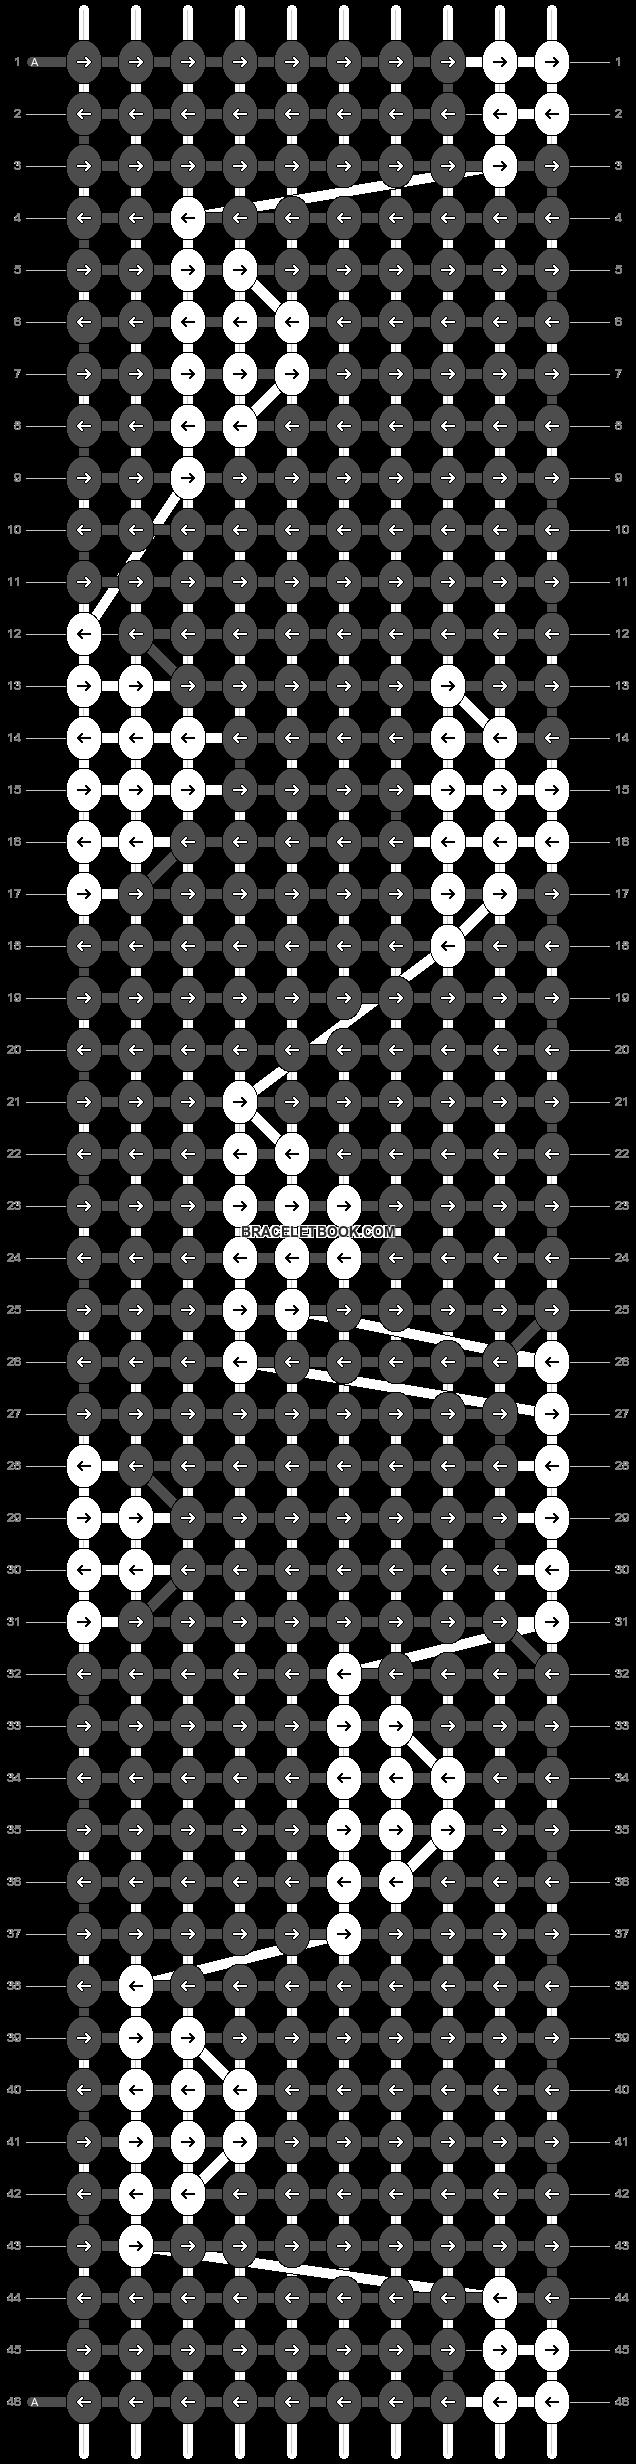 Alpha pattern #31115 variation #19994 pattern